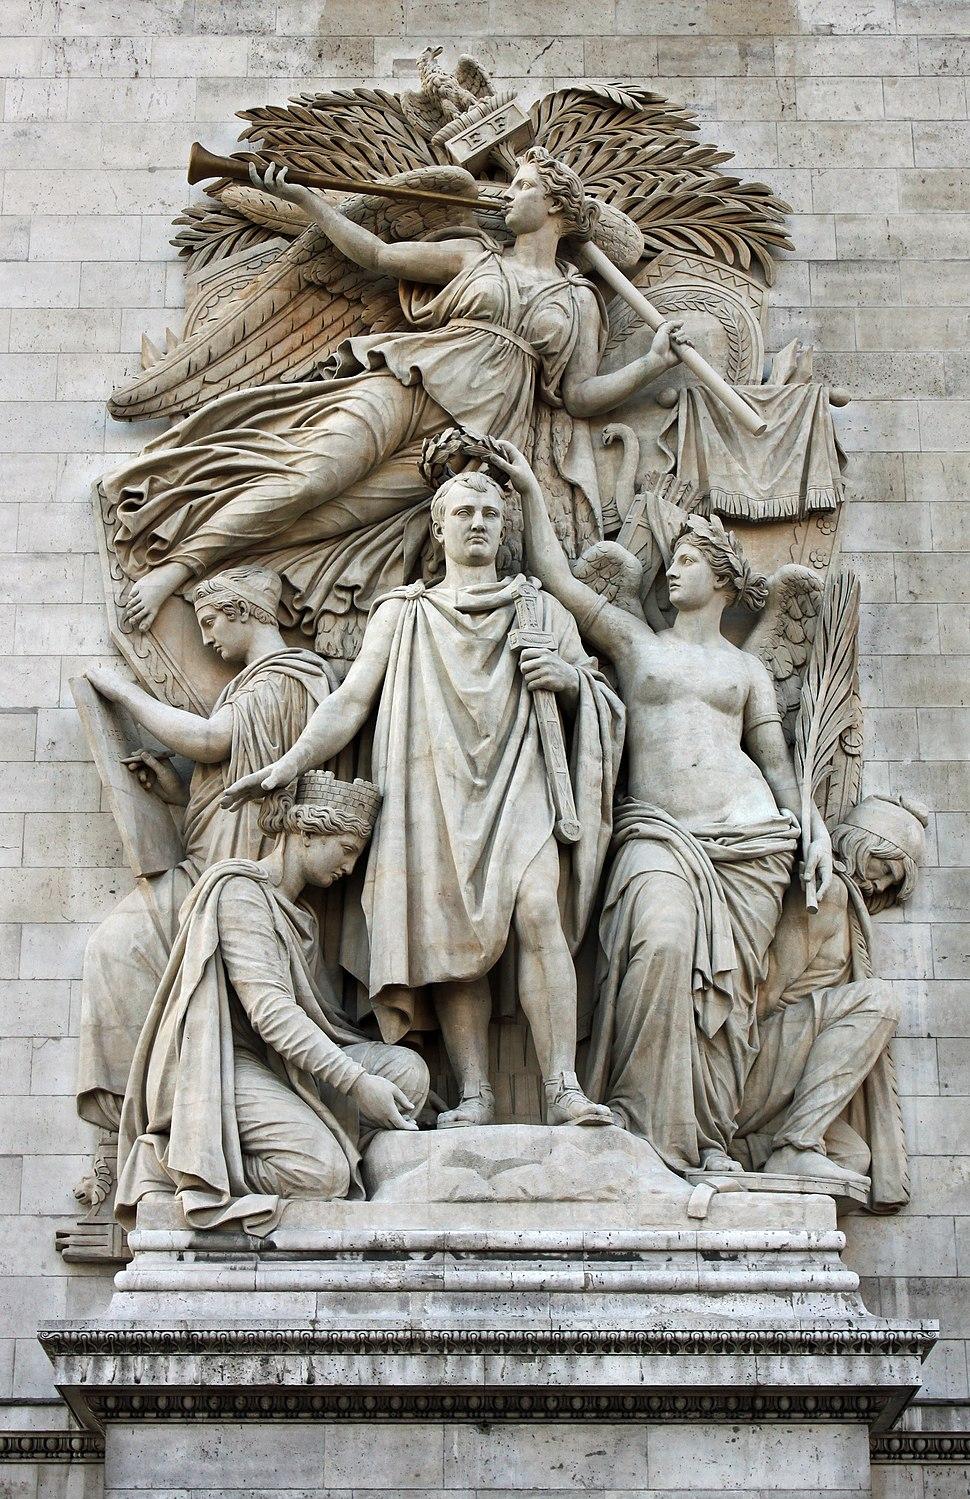 Le triomphe de 1810 jean-pierre cortot